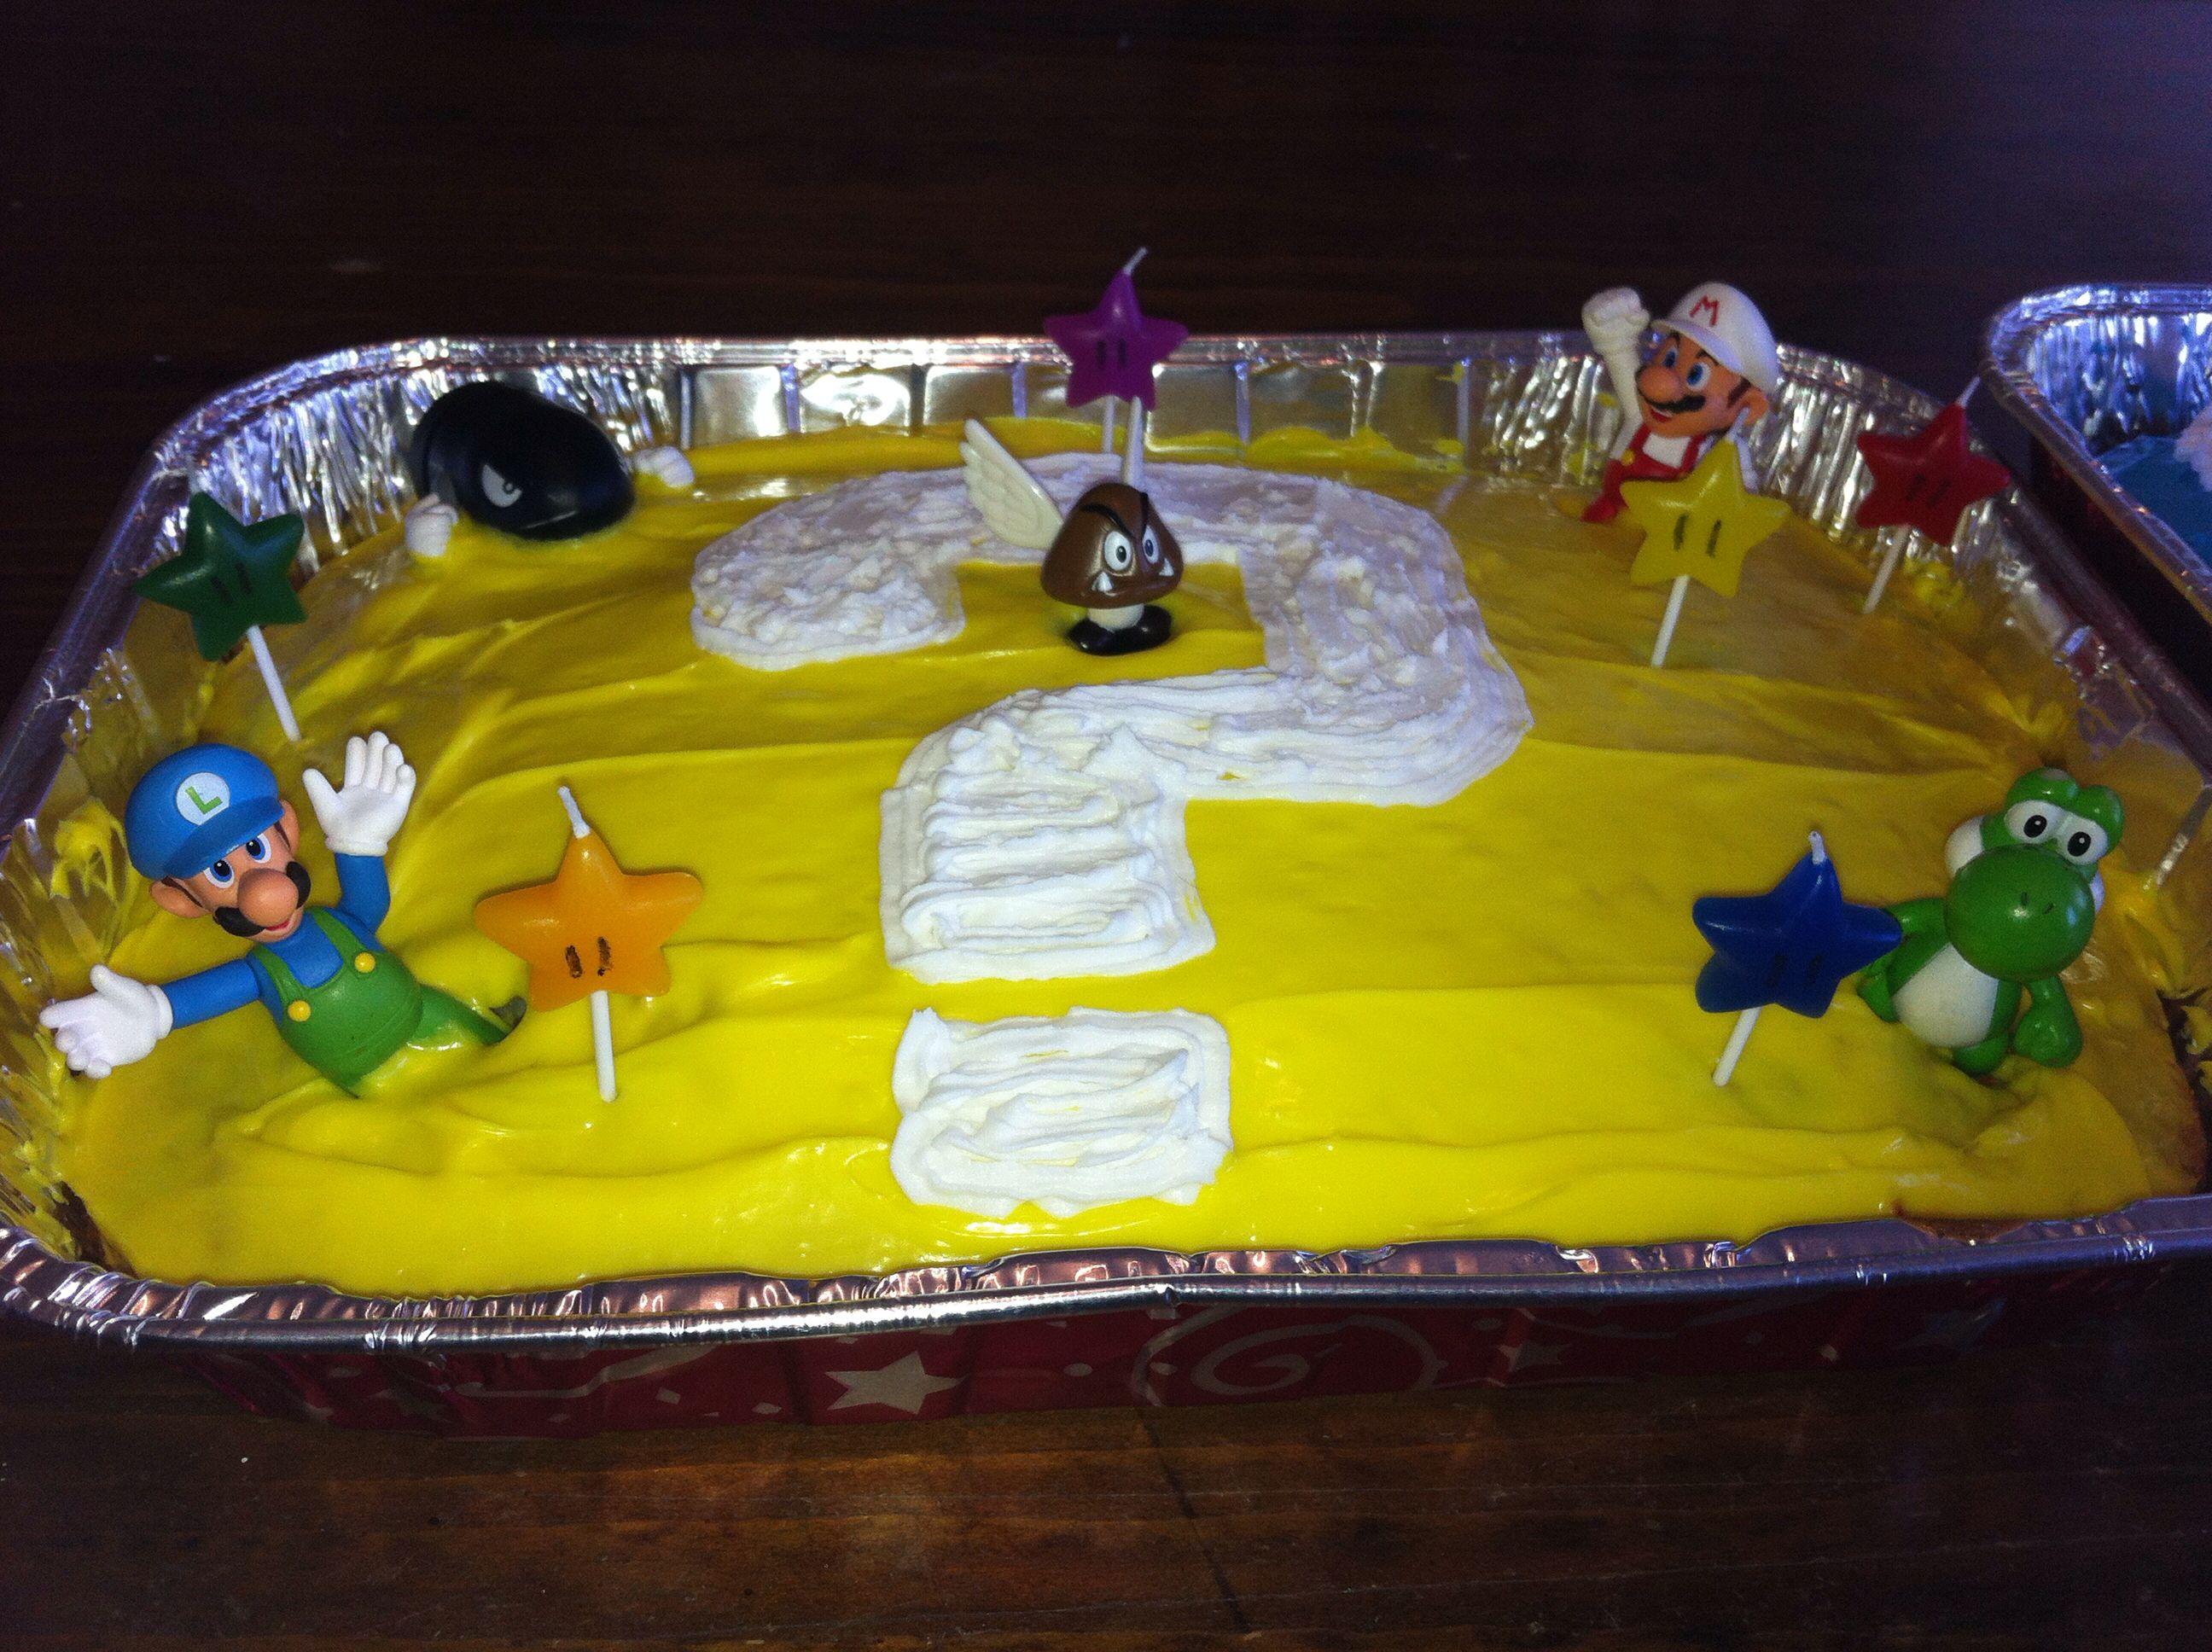 Super Mario Cake For A Mario Themed Birthday I Used My Son S